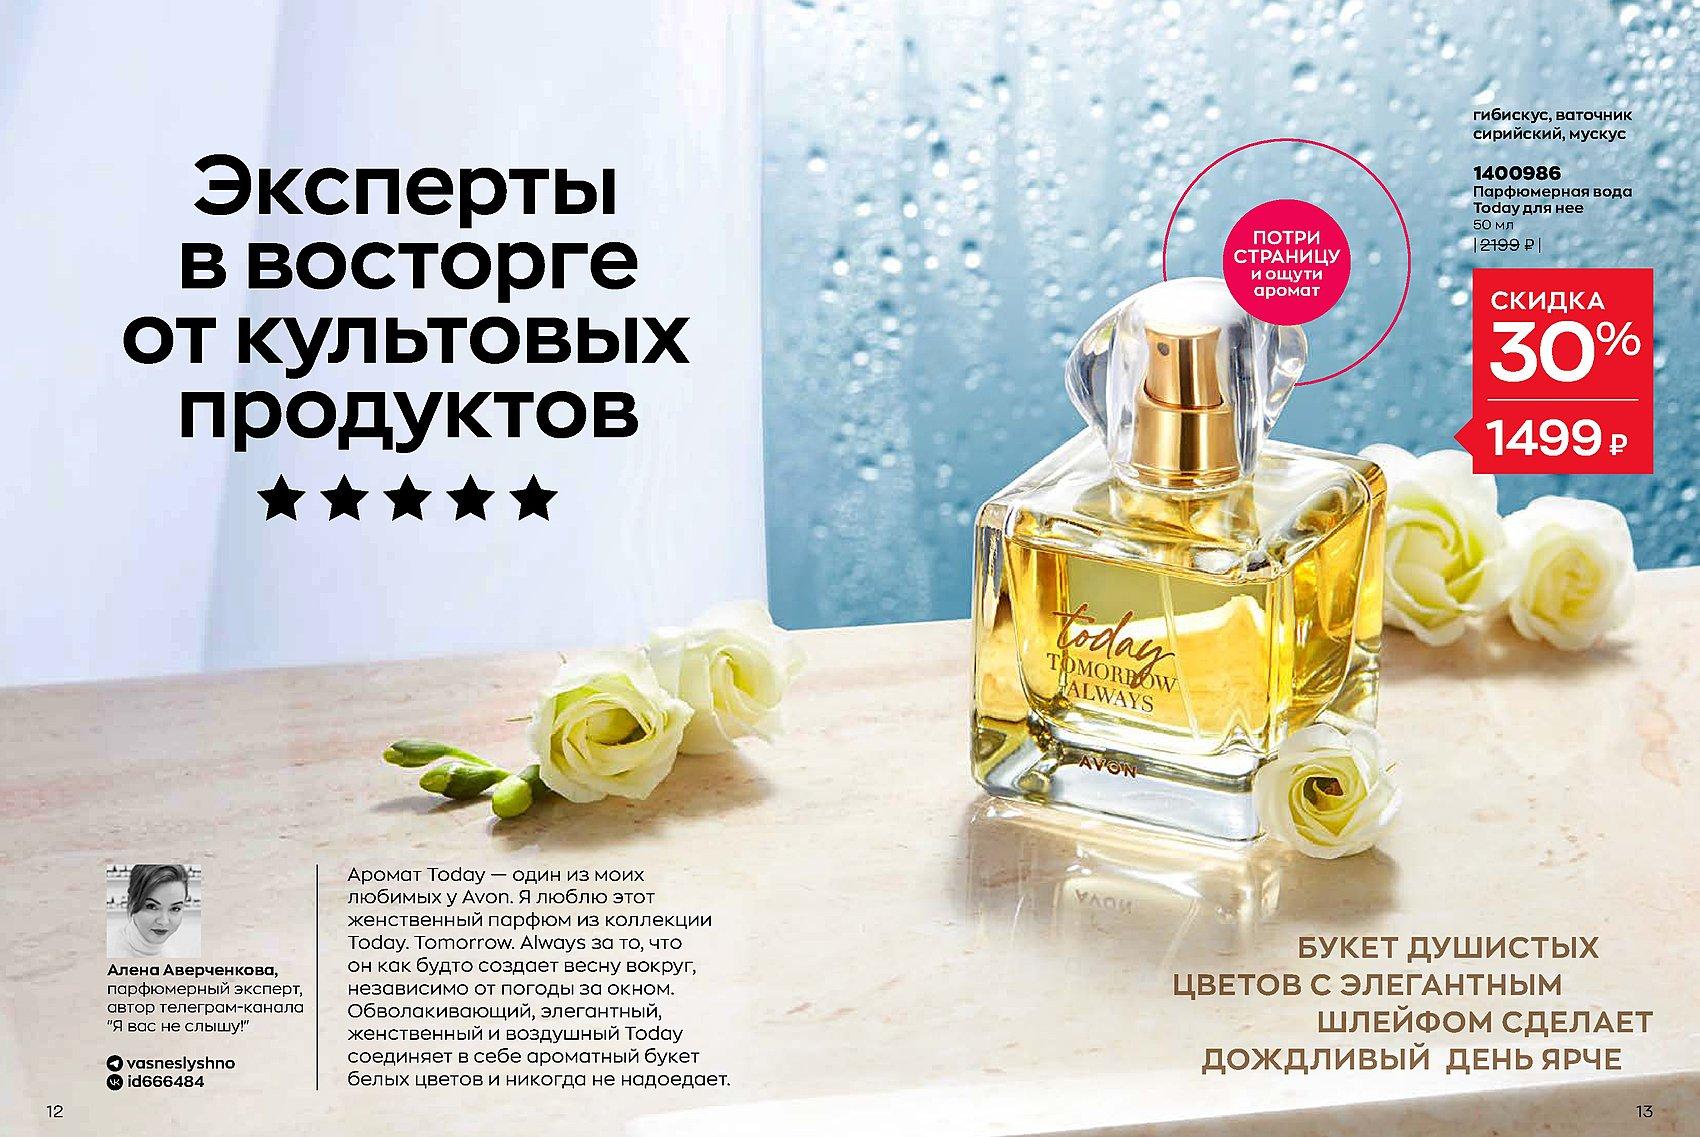 Страницы 12 - 13 каталог